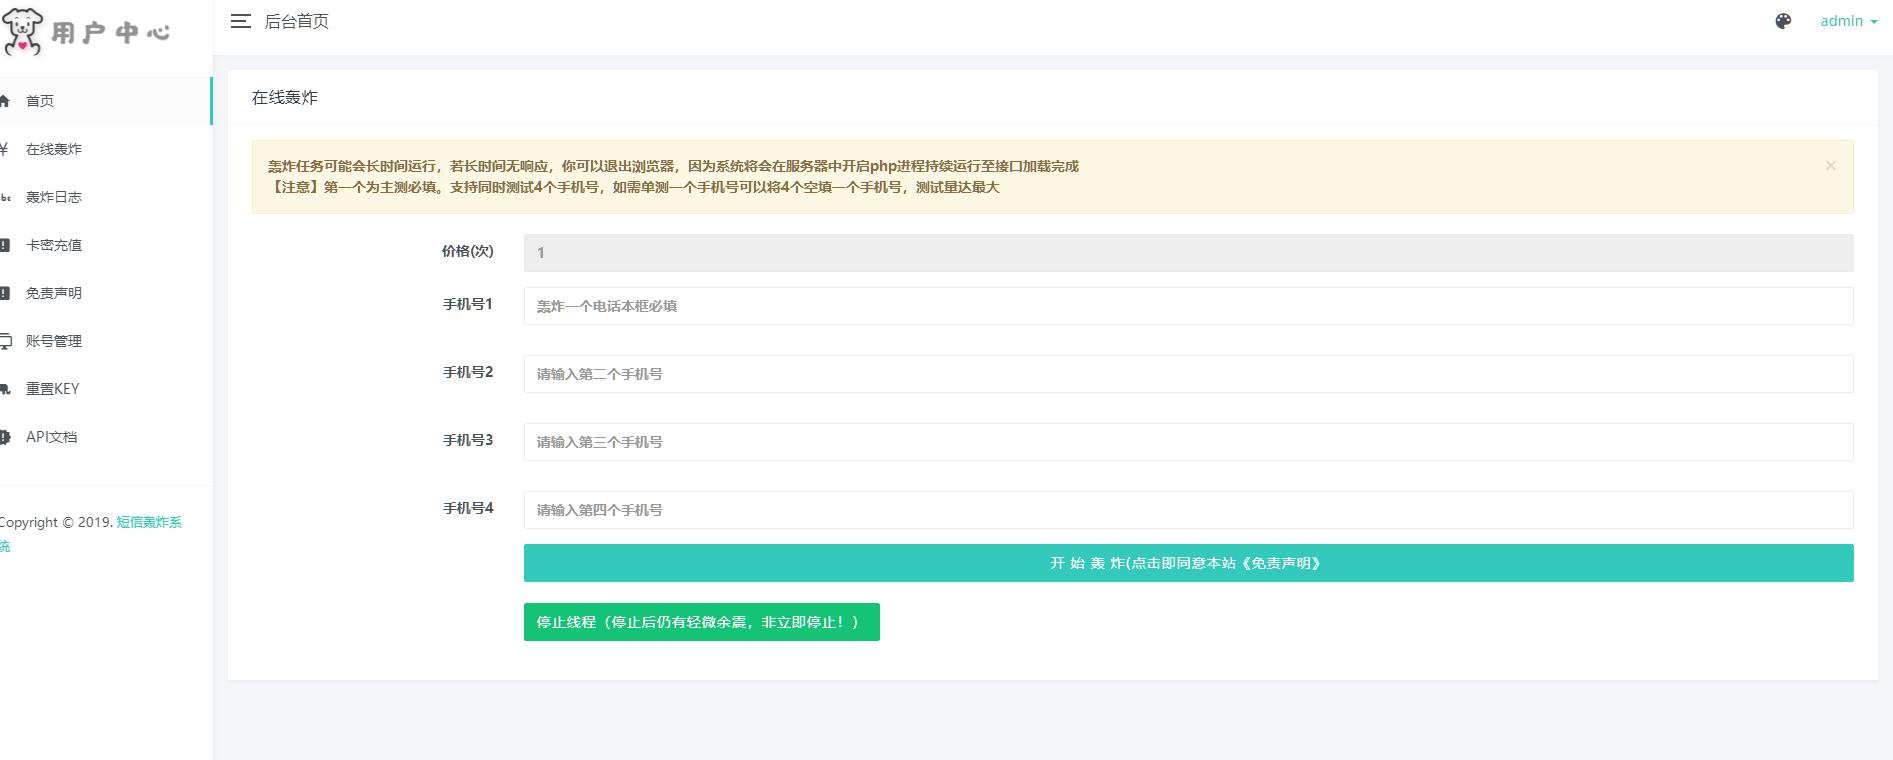 PHP短信轰炸机系统v2.1